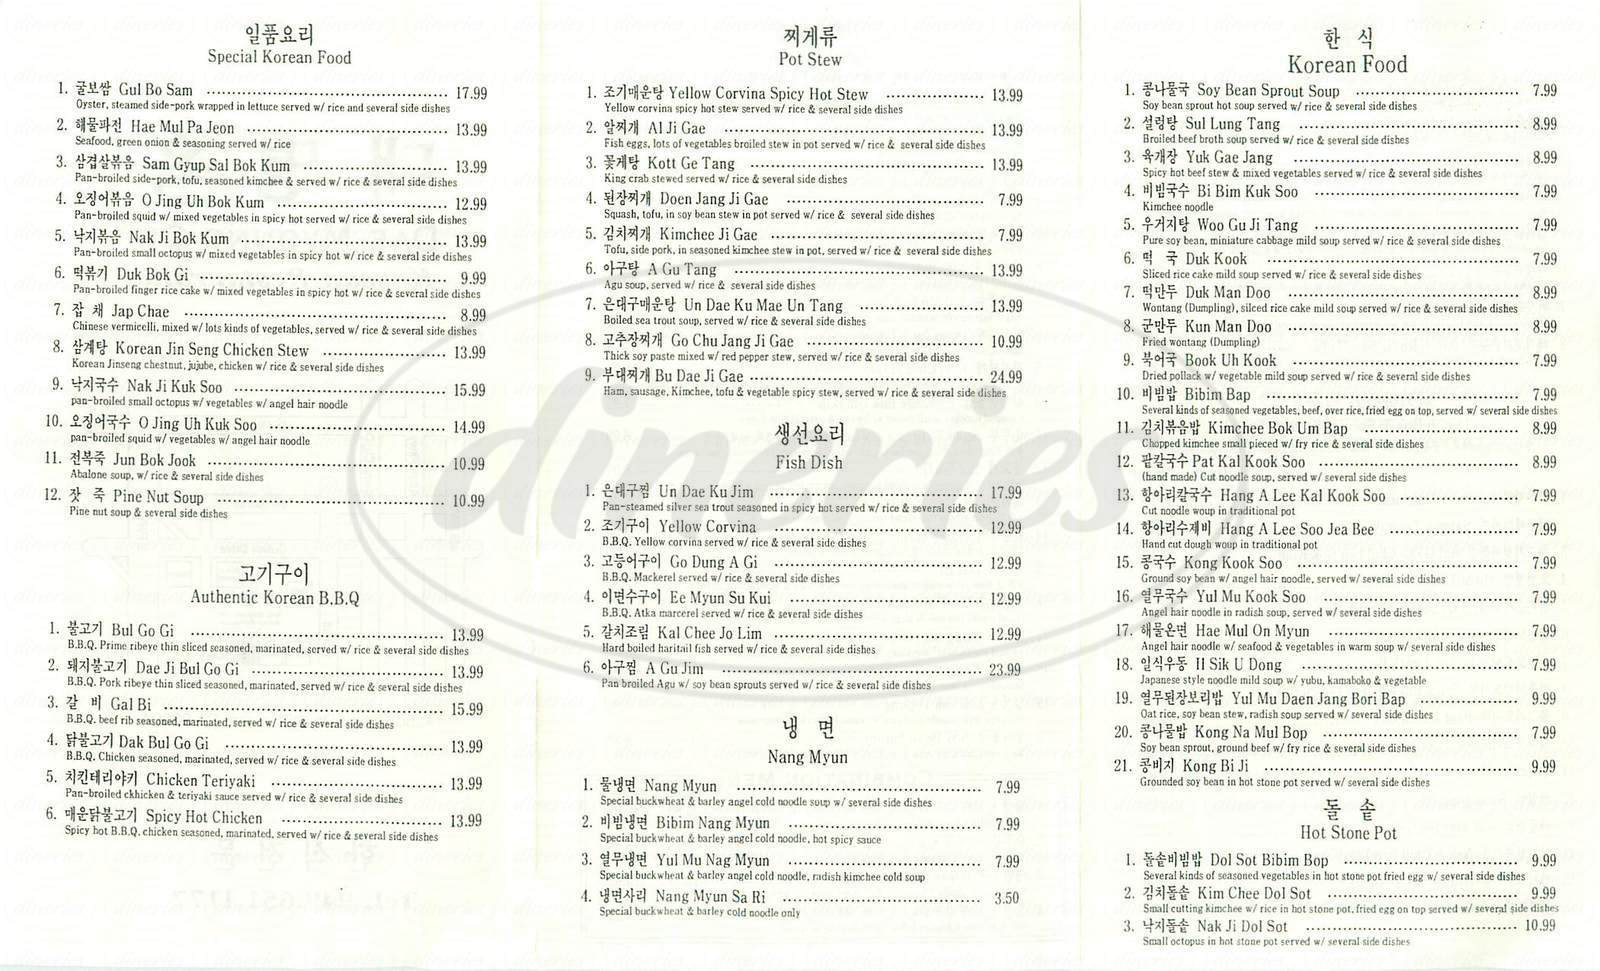 menu for Dae Myoung Ok Restaurant